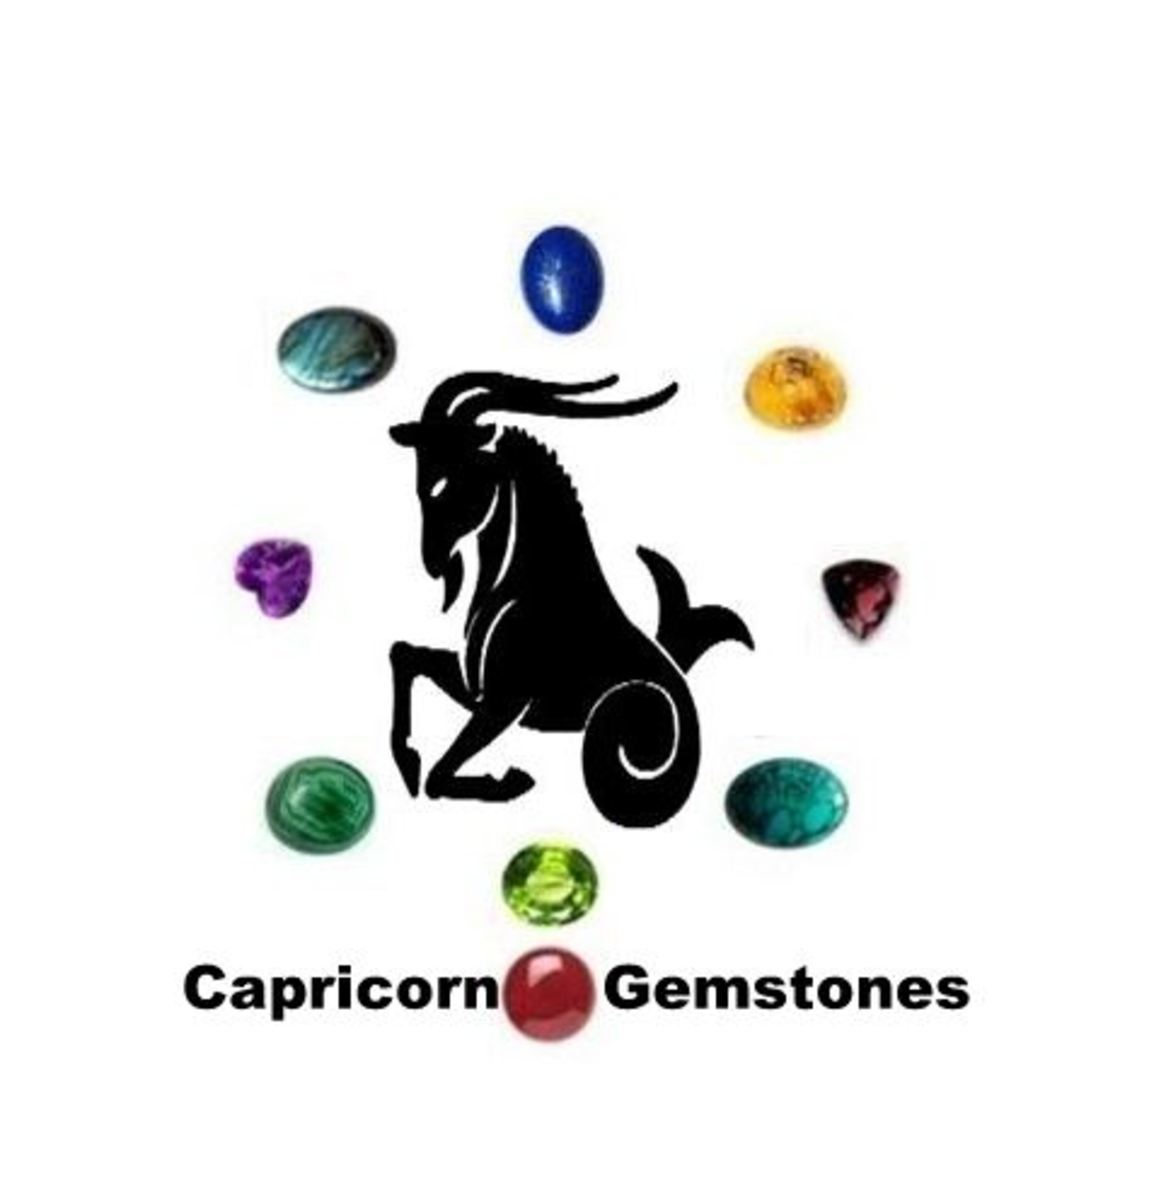 Capricorn Gemstones : Lapis Lazuli, Peridot, Amethyst, Garnet, Malachite, Amber, Turquoise, Labradorite and Carnelian.